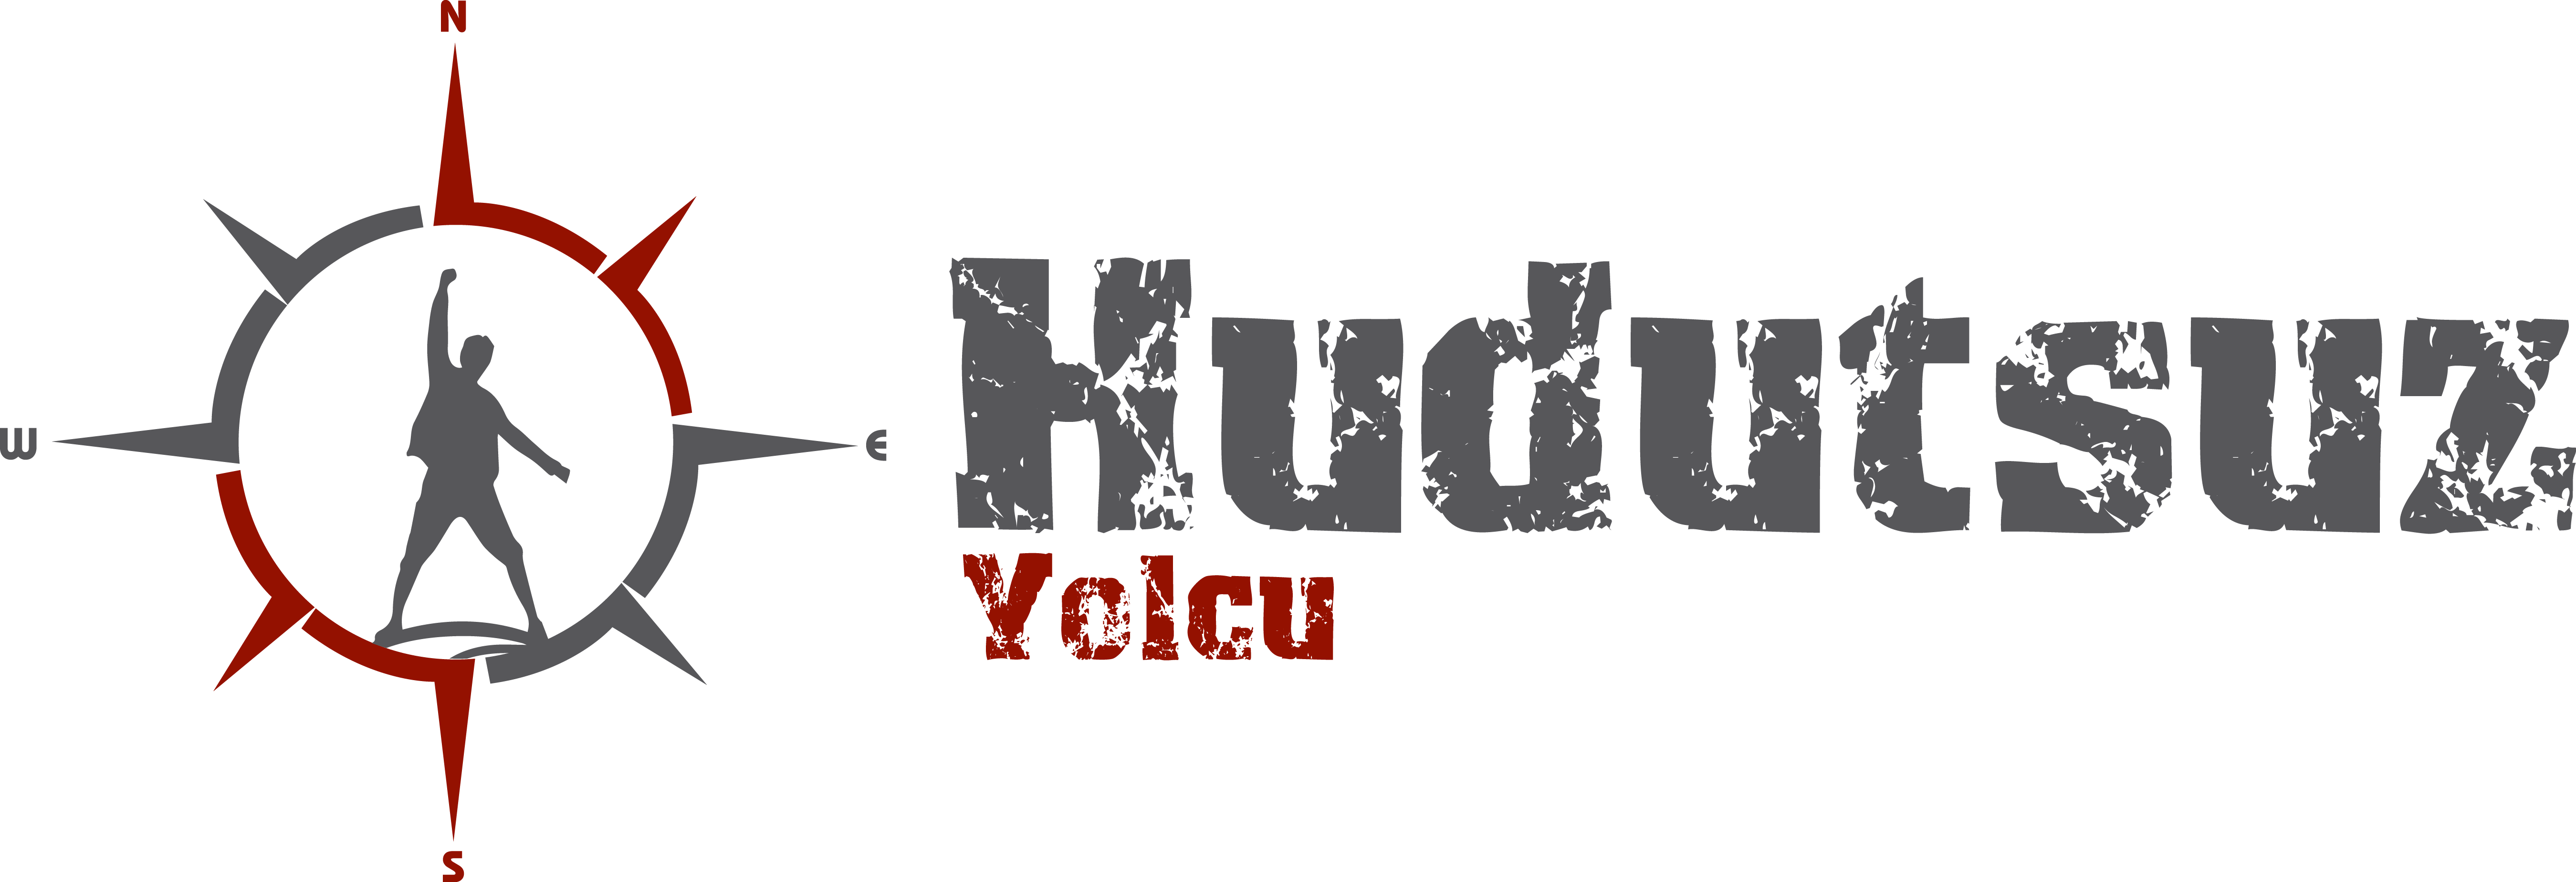 Hudutsuz Yolcu